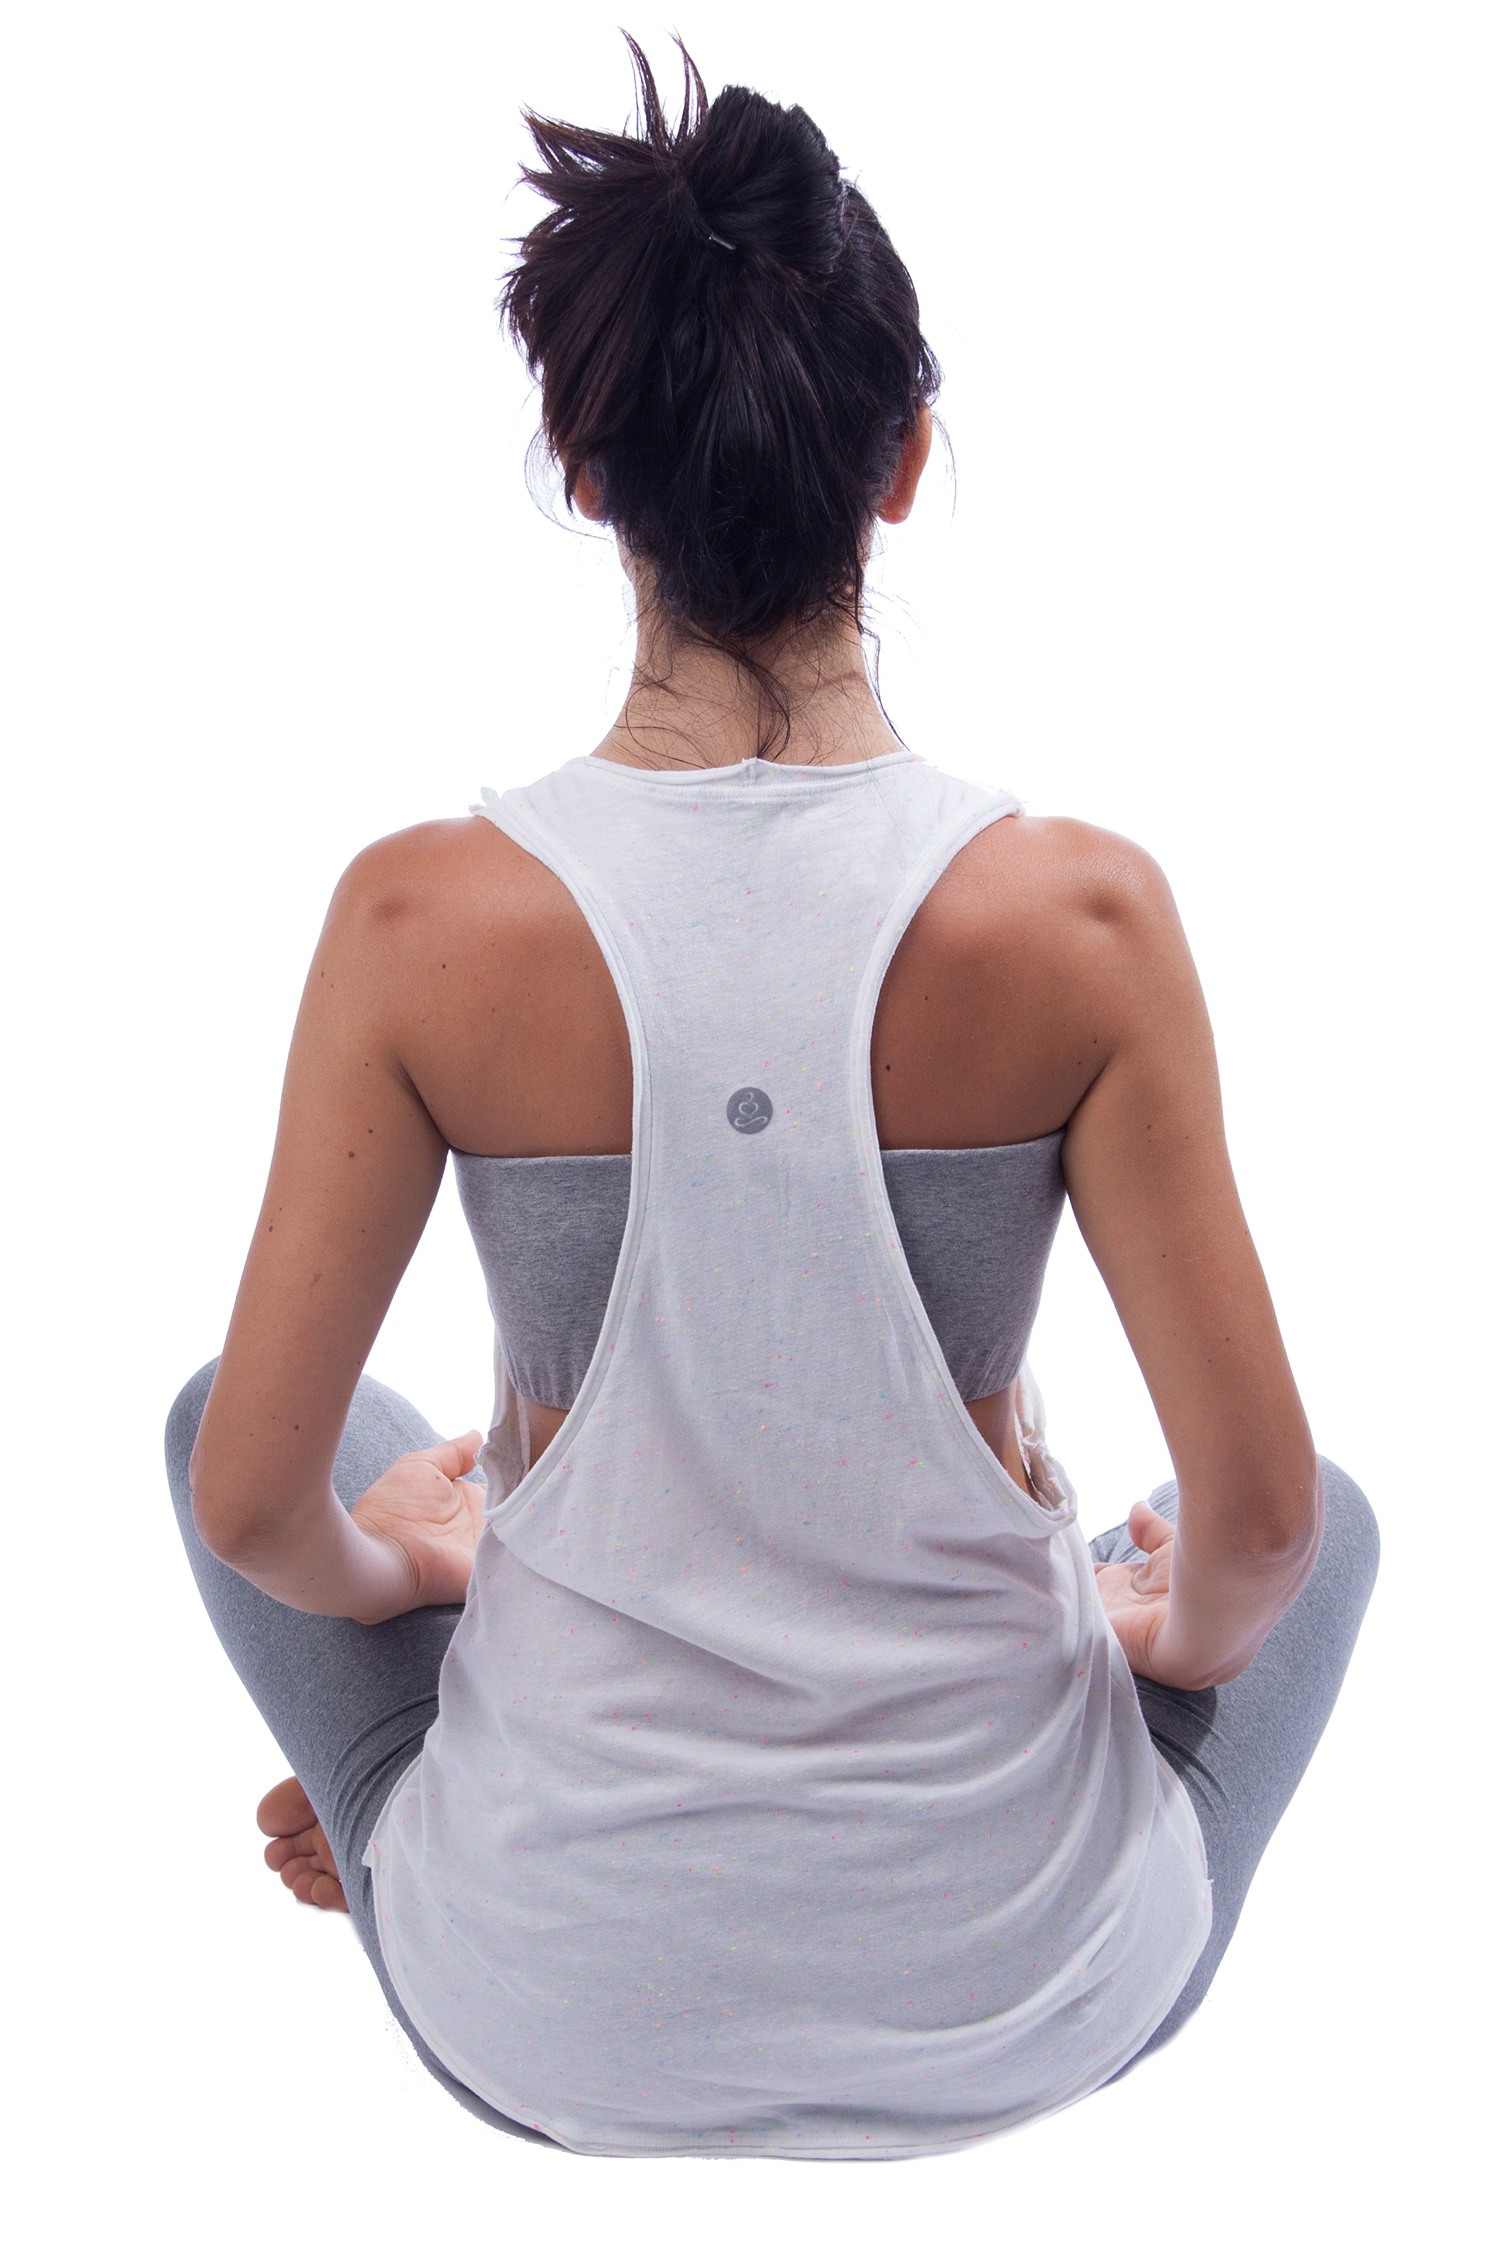 6c85300b9debfb Organic Cotton Yoga Vest - Loose Racerback Yoga Tank - Candy Sprinkled  White Yoga Top ...